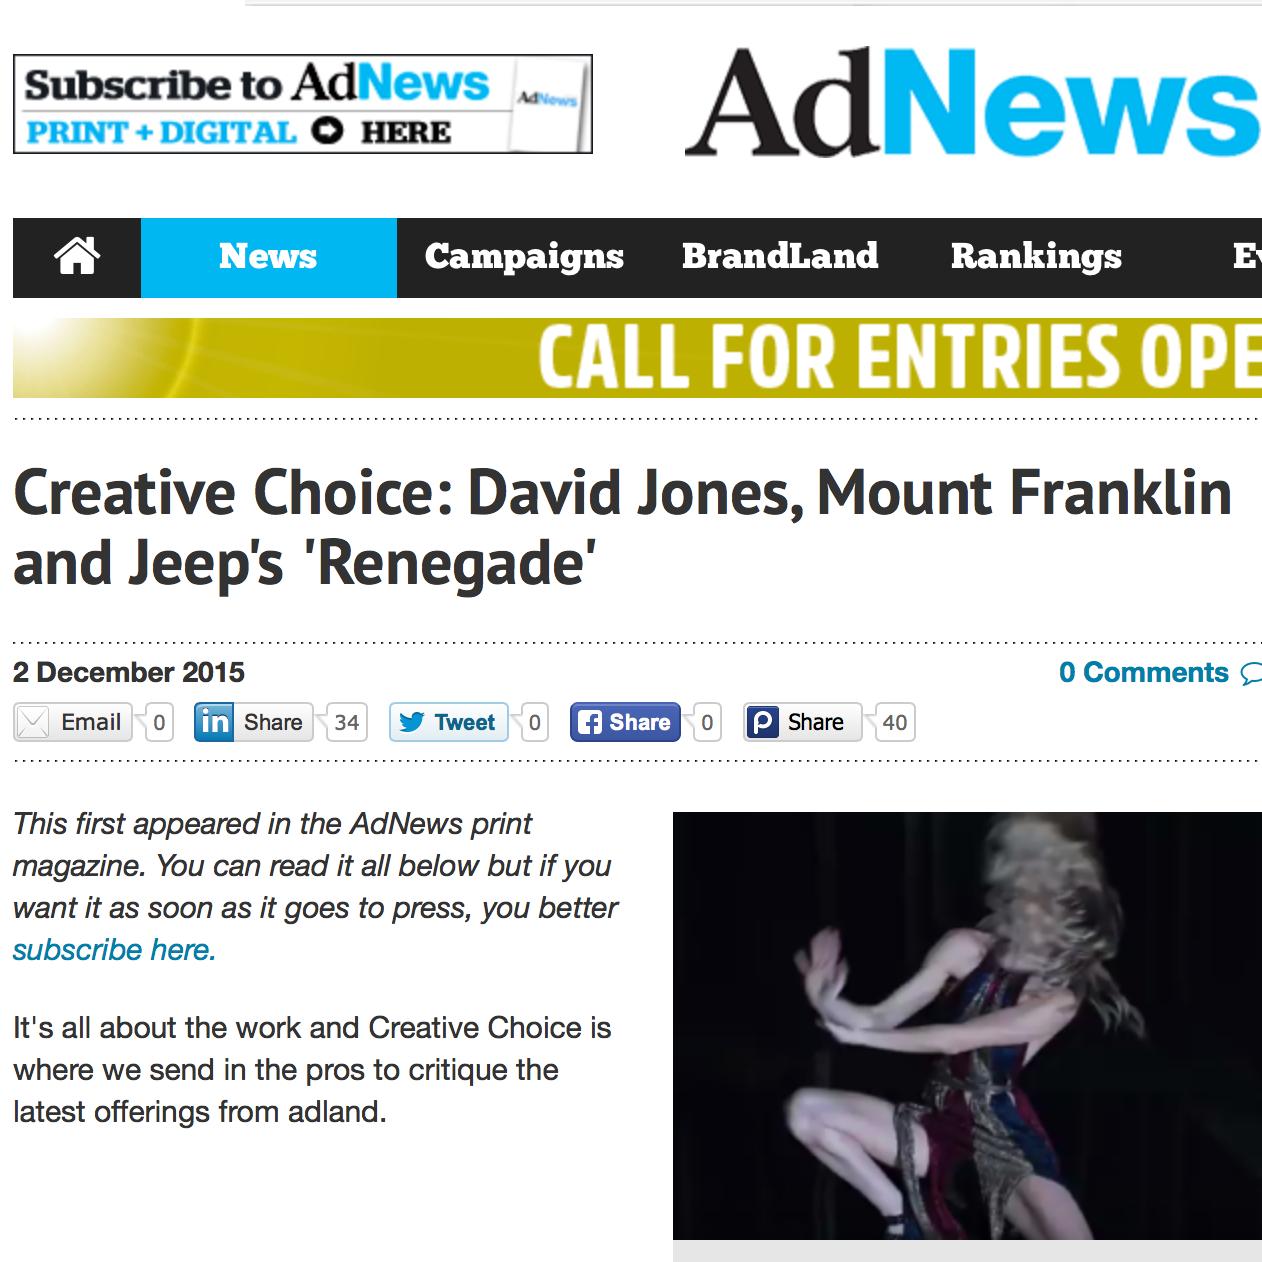 ADNEWS   Creative Choice: David Jones, Mount Franklin and Jeep's 'Renegade'